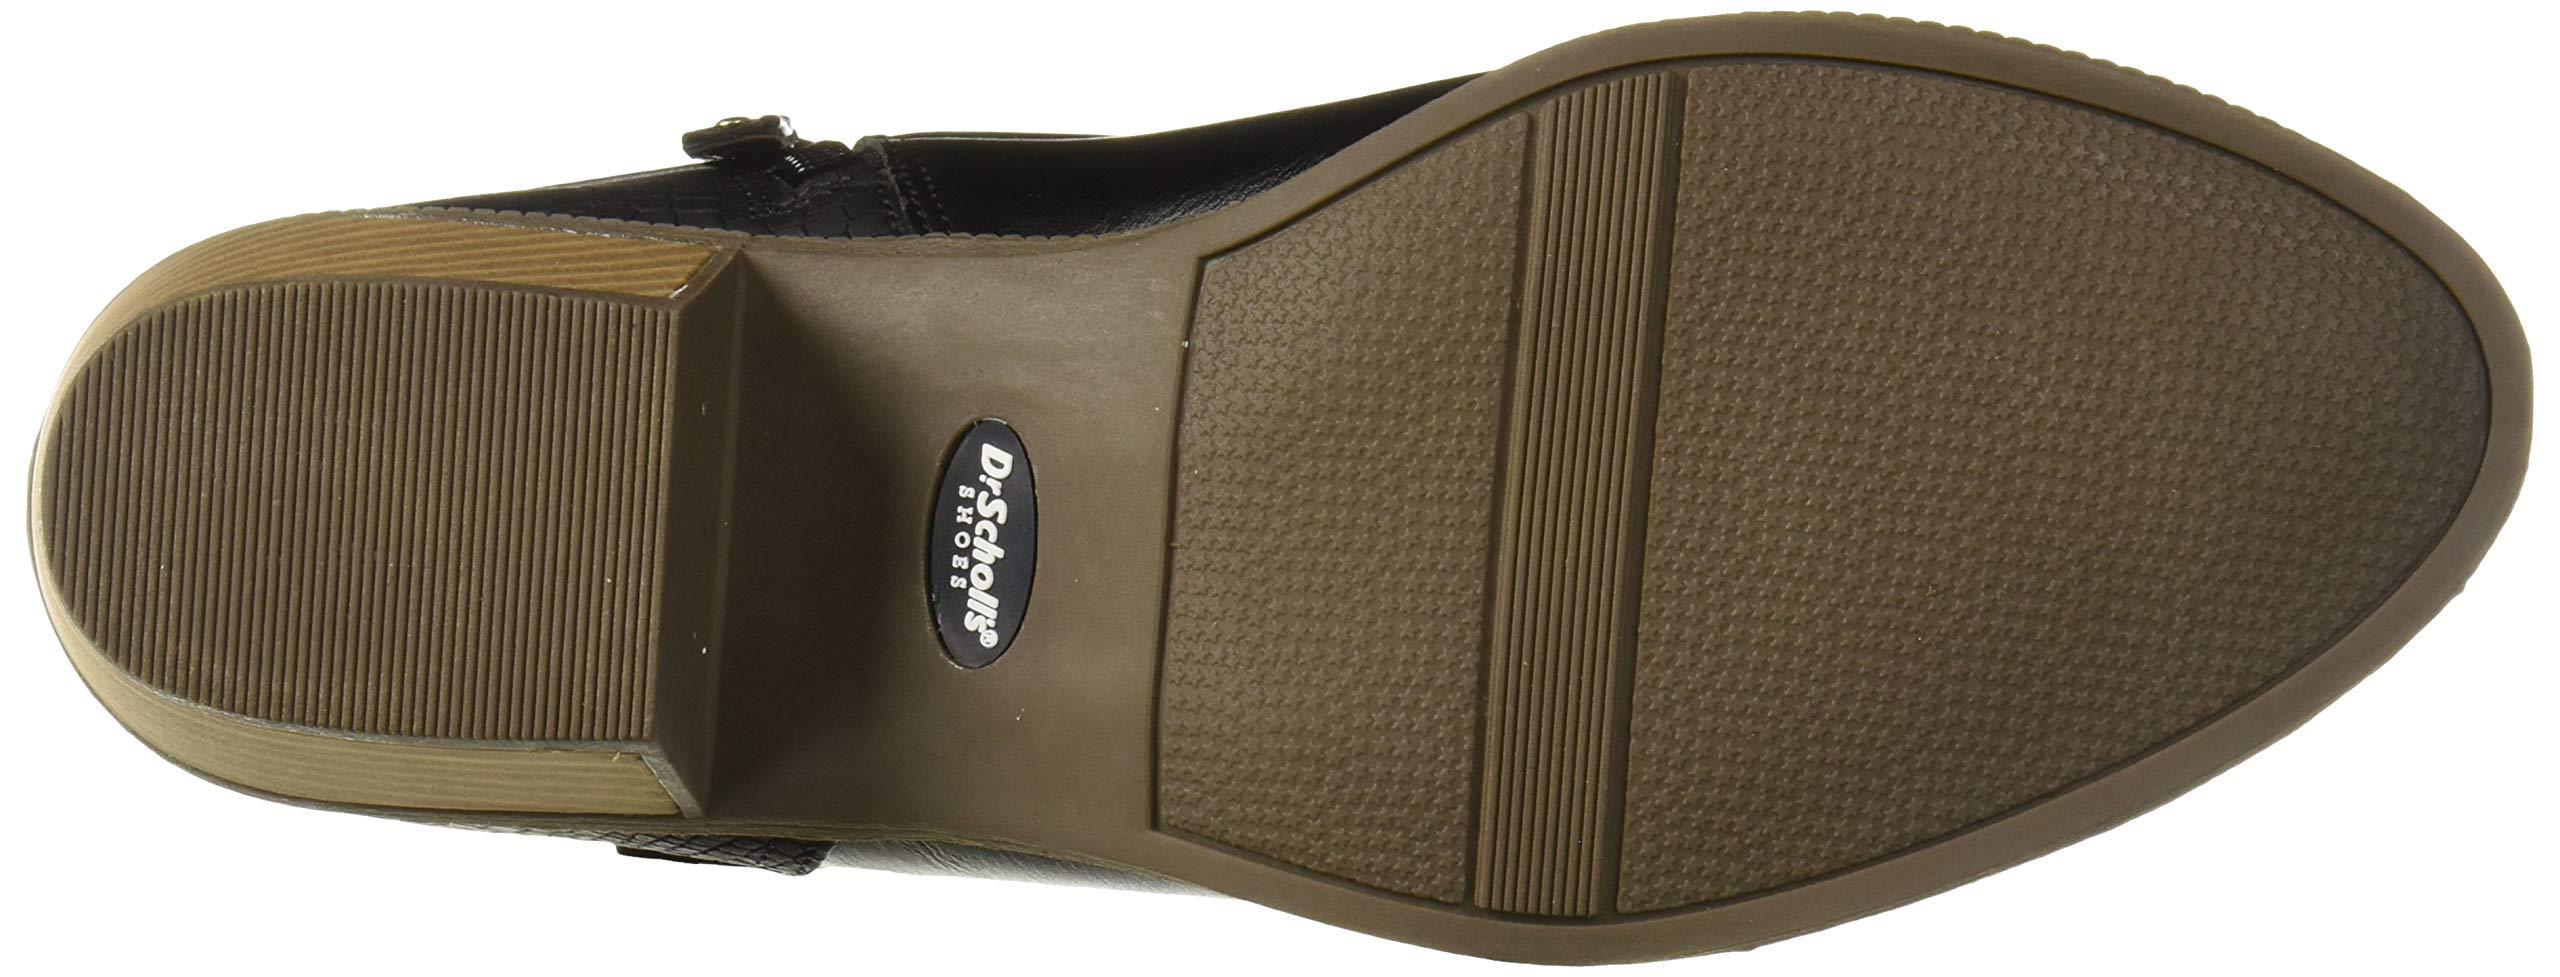 Dr. Scholl's Shoes Women's Bobbi Ankle Boot